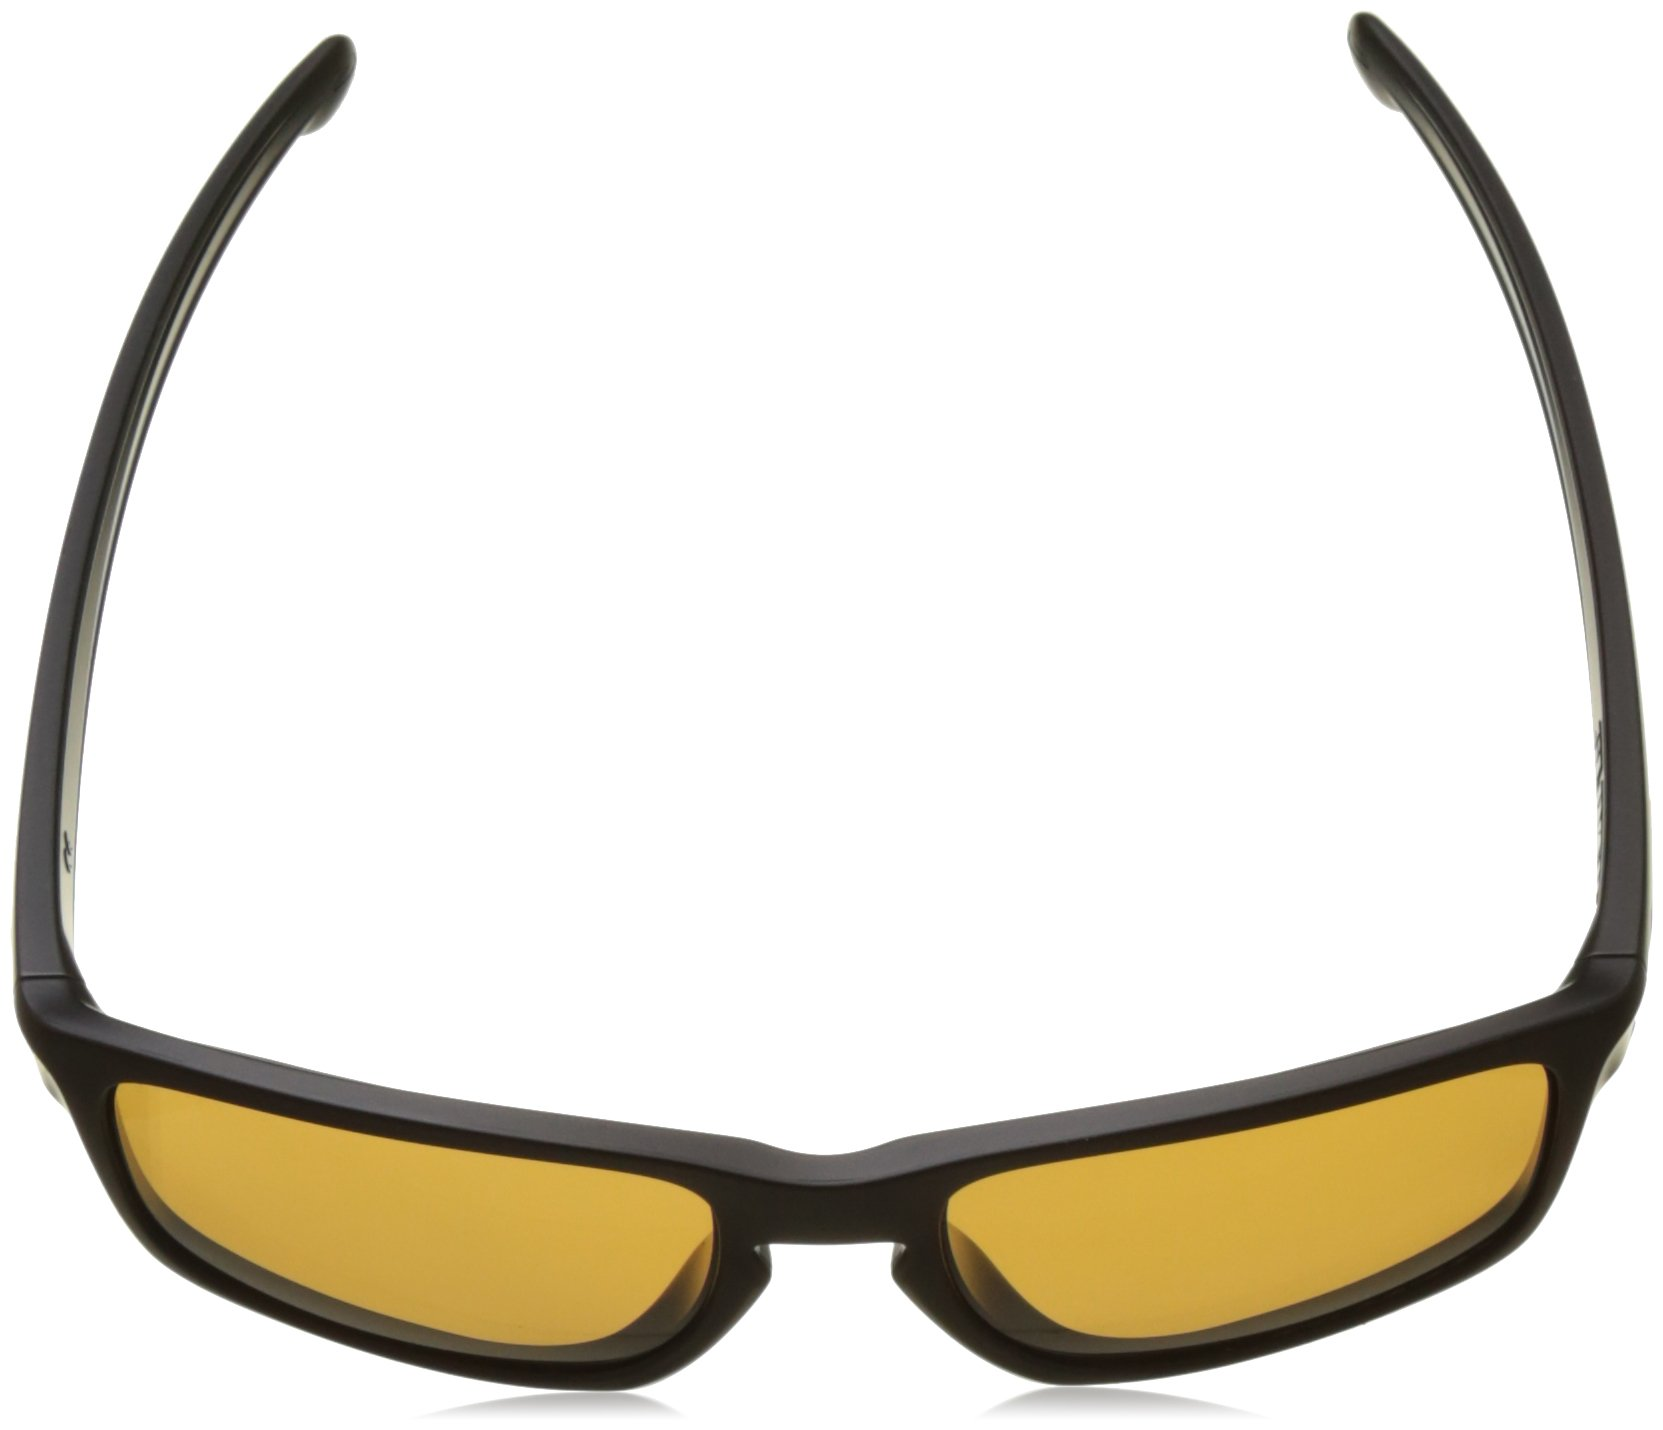 Oakley Men's Sliver OO9262-08 Polarized Rectangular Sunglasses, Matte Black, 57 mm by Oakley (Image #4)